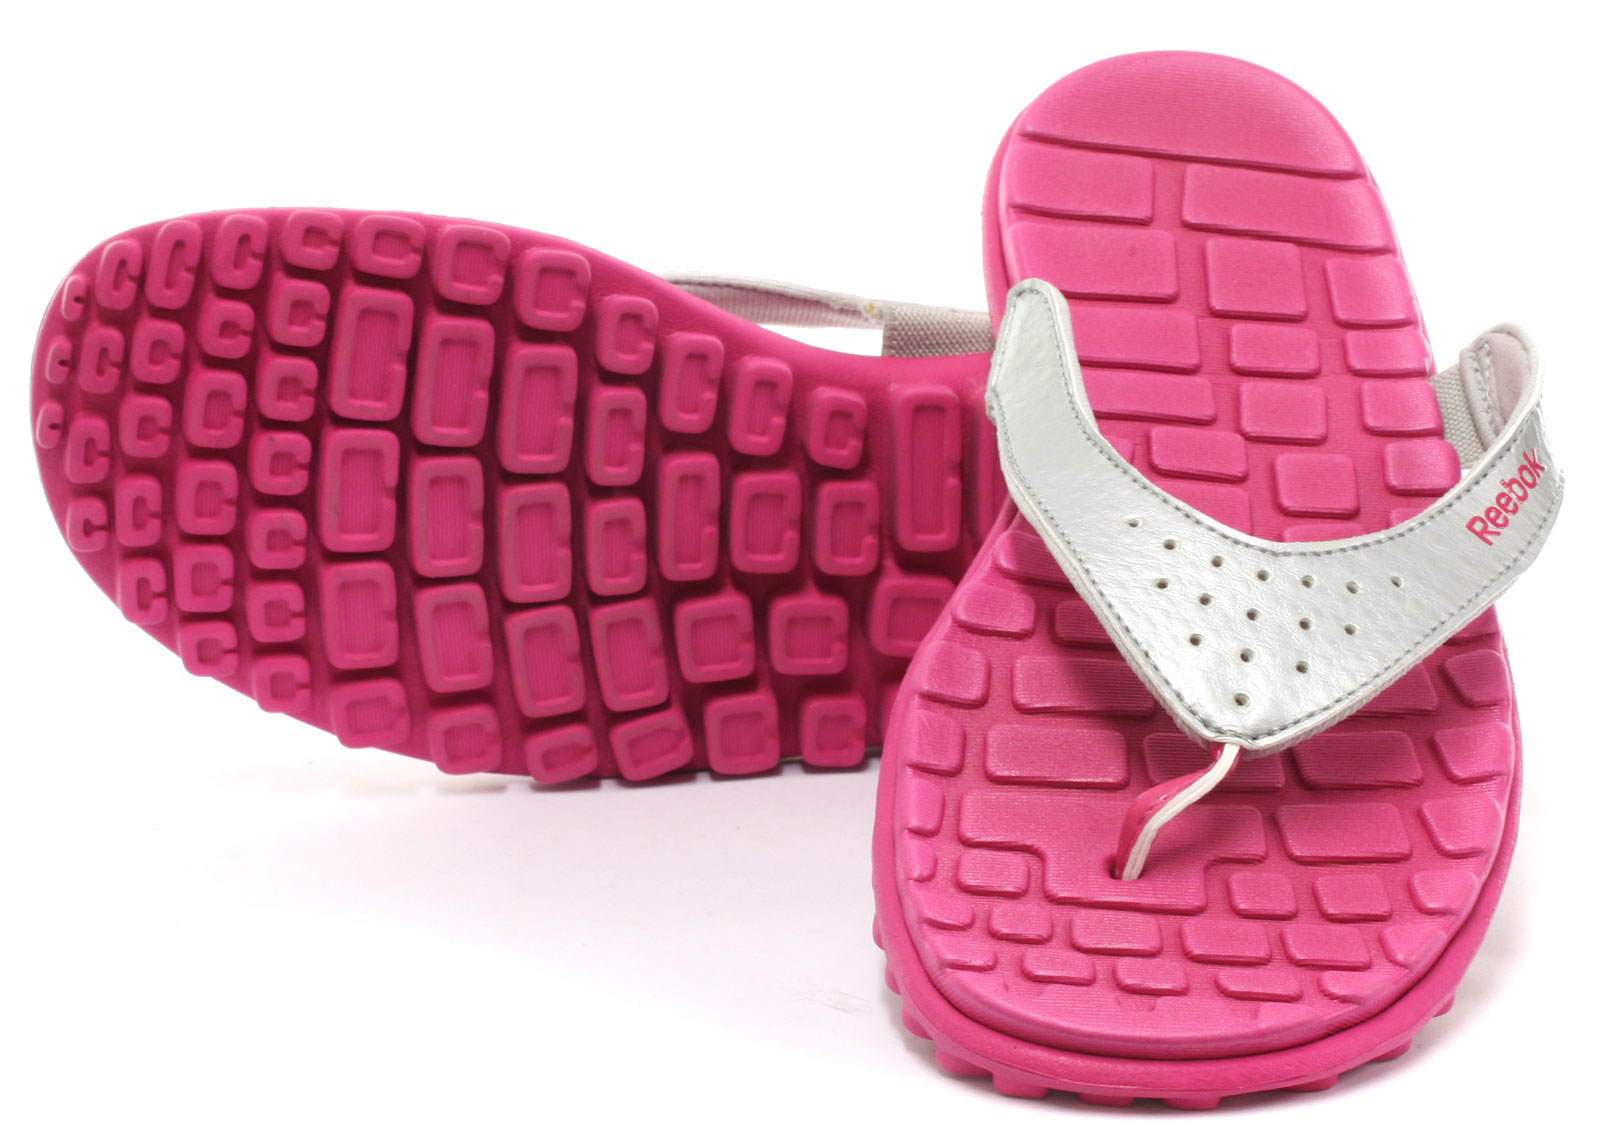 39f94fa22 New Reebok RealFlex Flip Womens Flip Flops   Thong Sandals Size UK ...